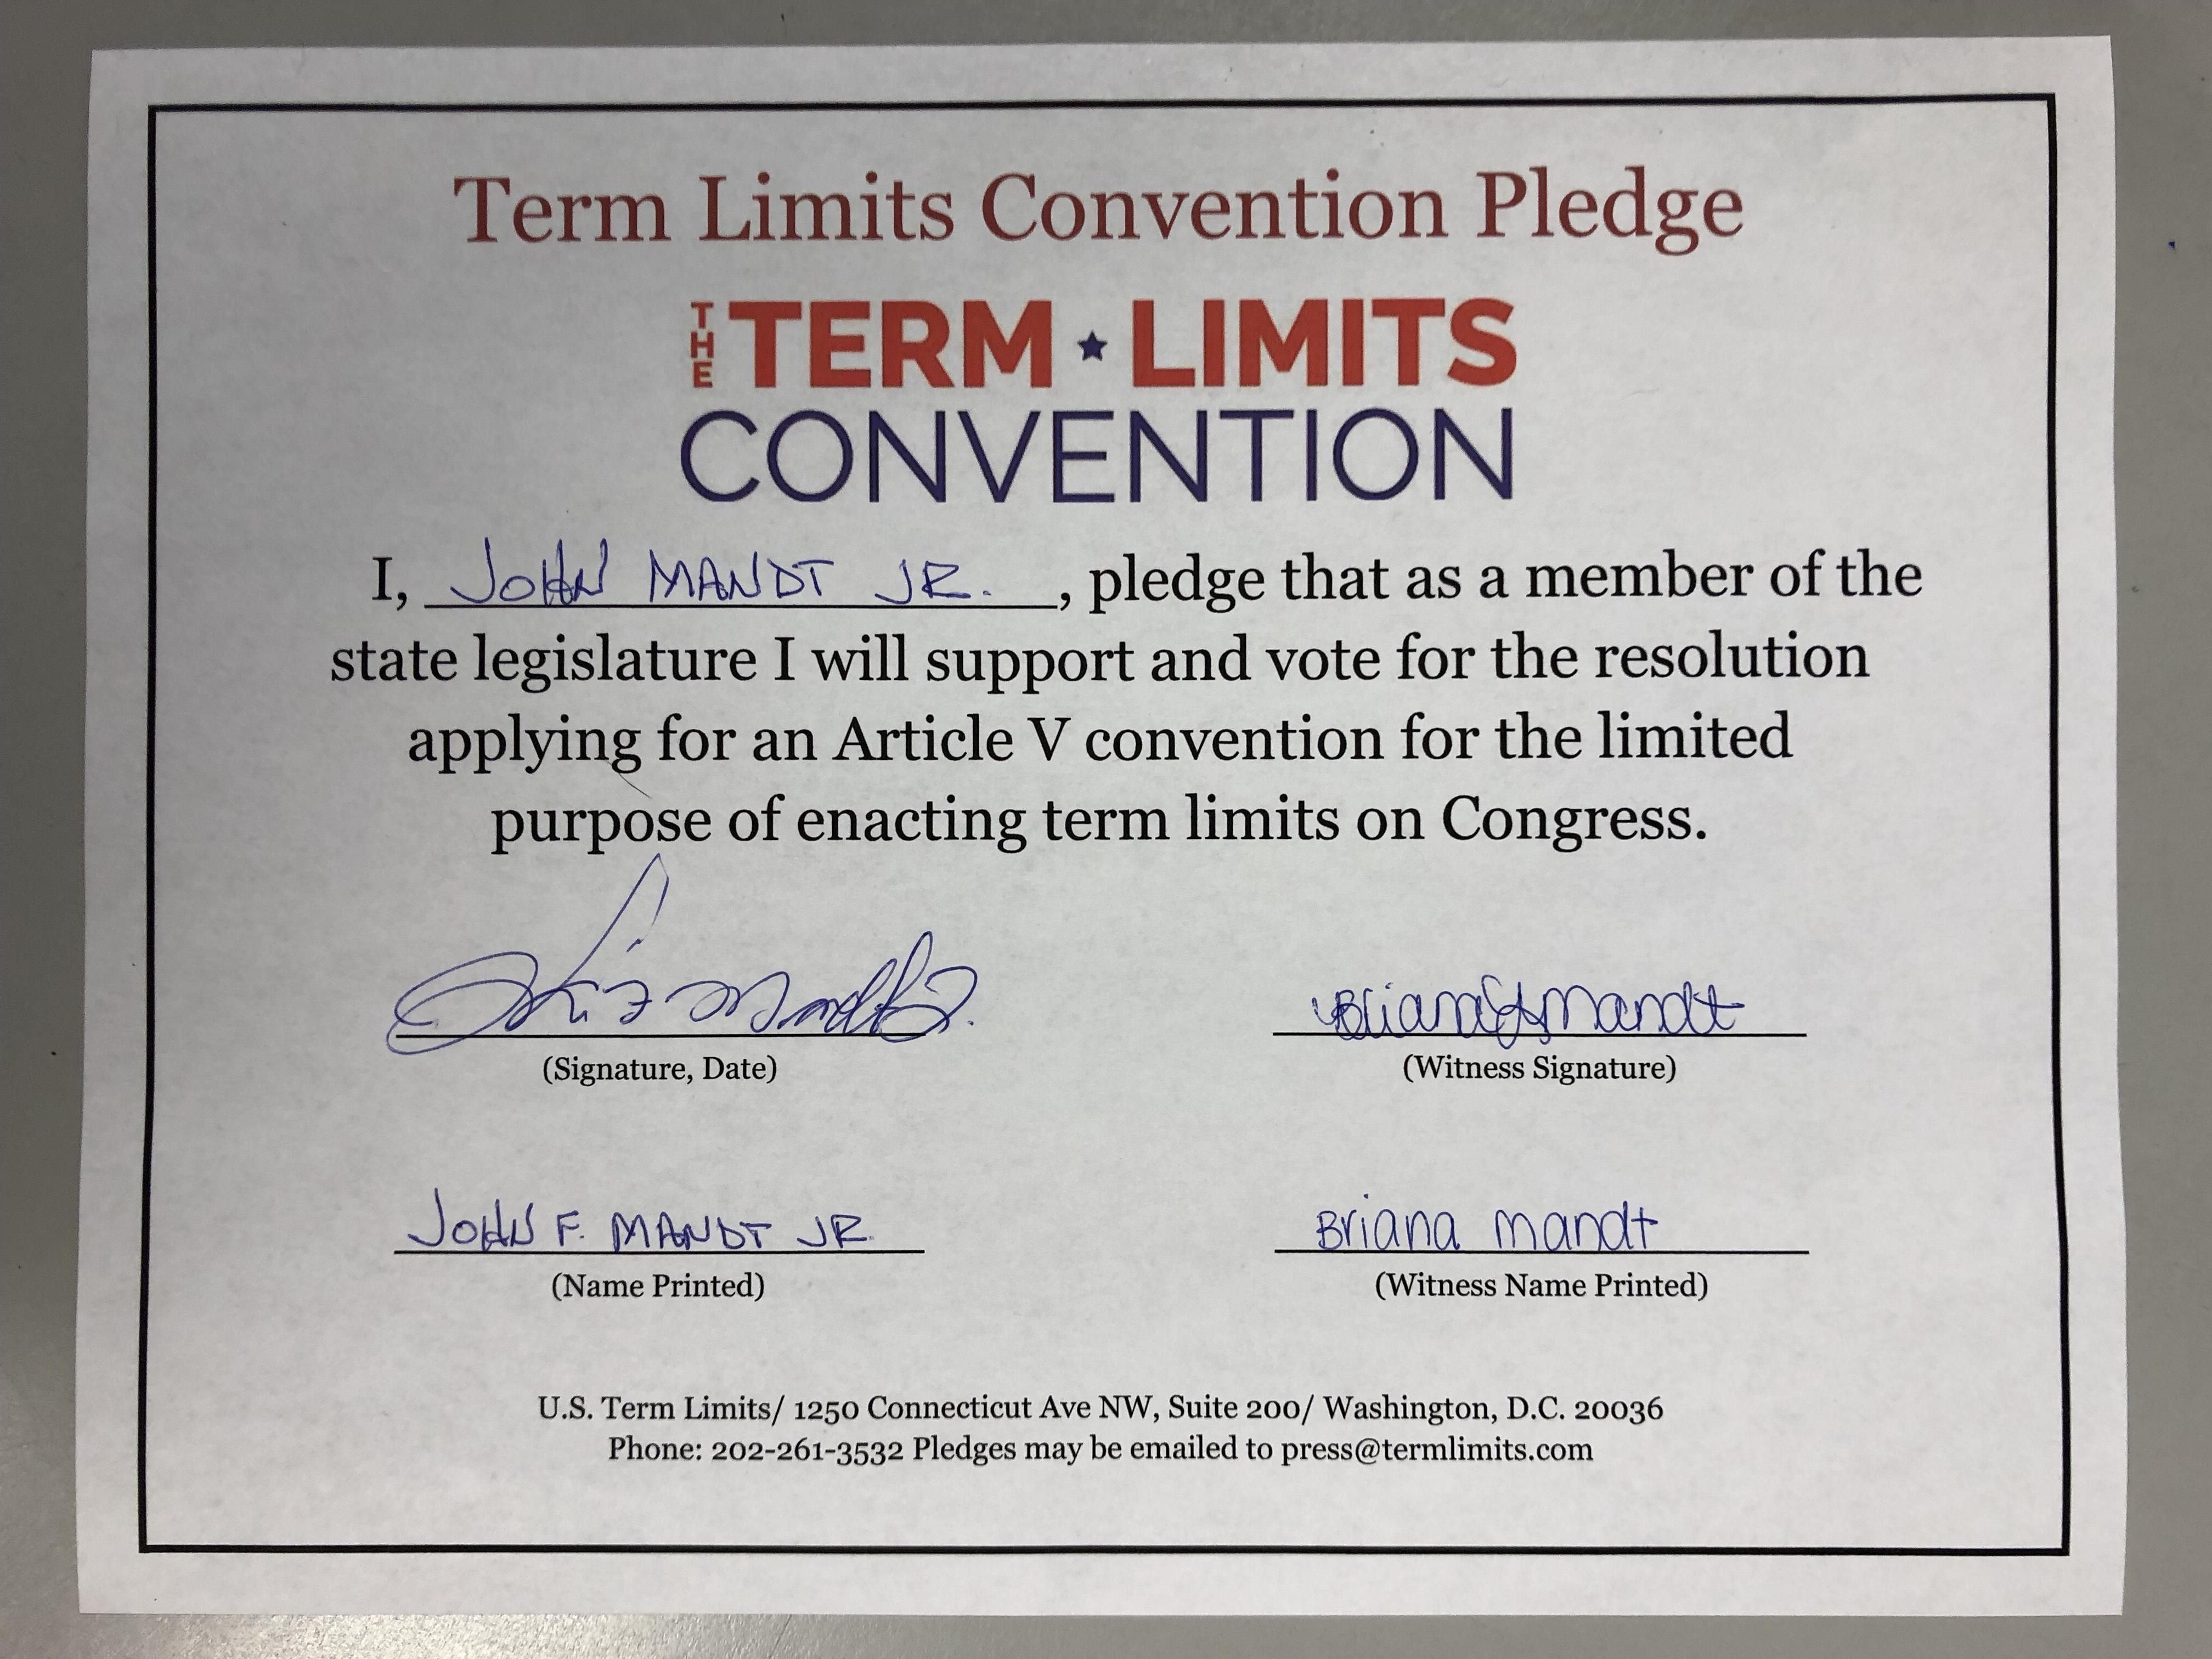 Us Term Limits Praises John Mandt Jr For Signing Pledge Us